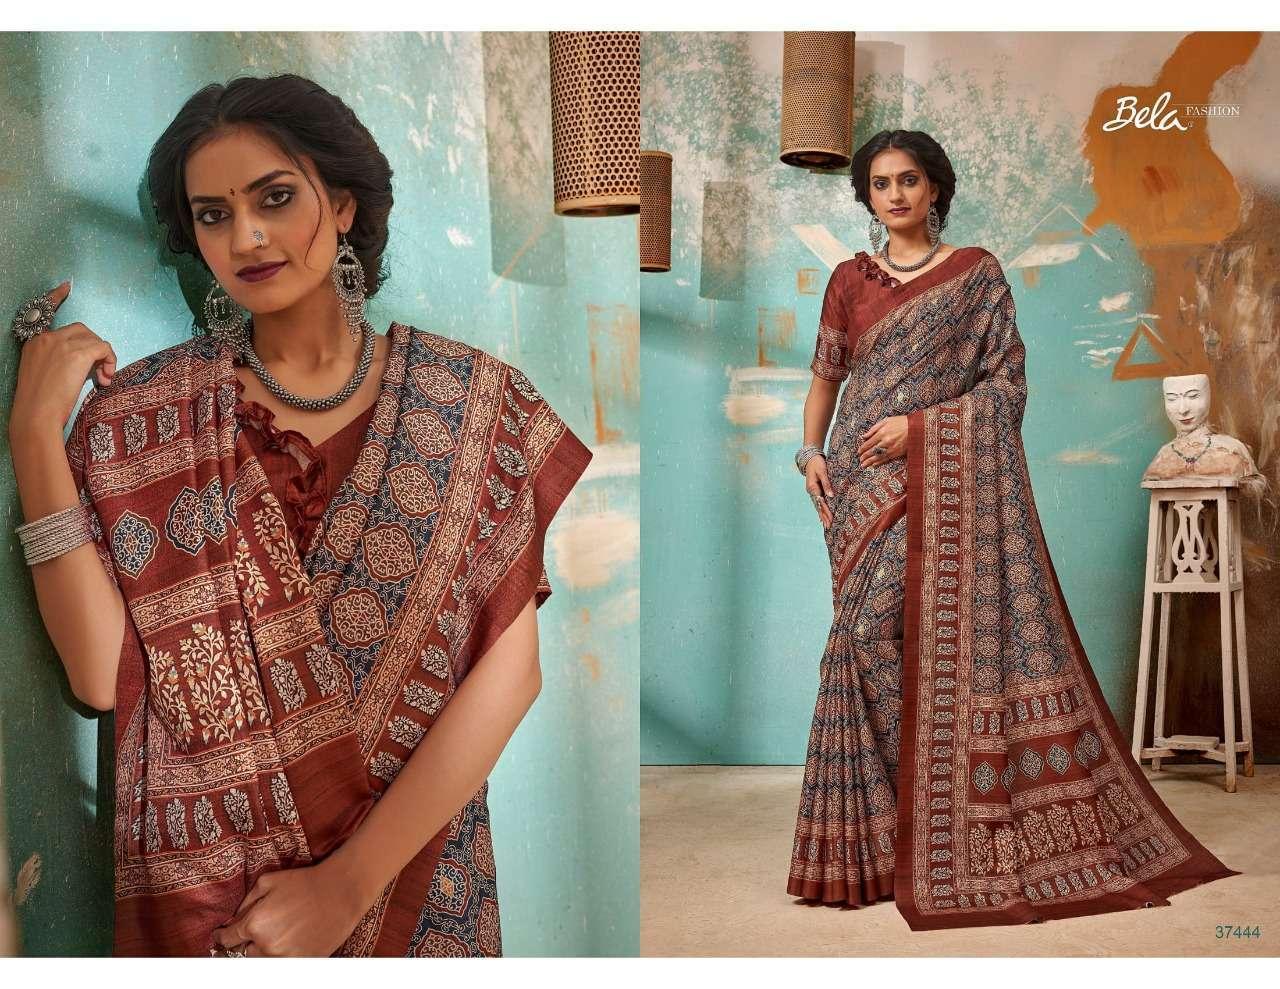 Bela Fashion Tulsi Khadi Silk With Digital Print Sarees Collection 05